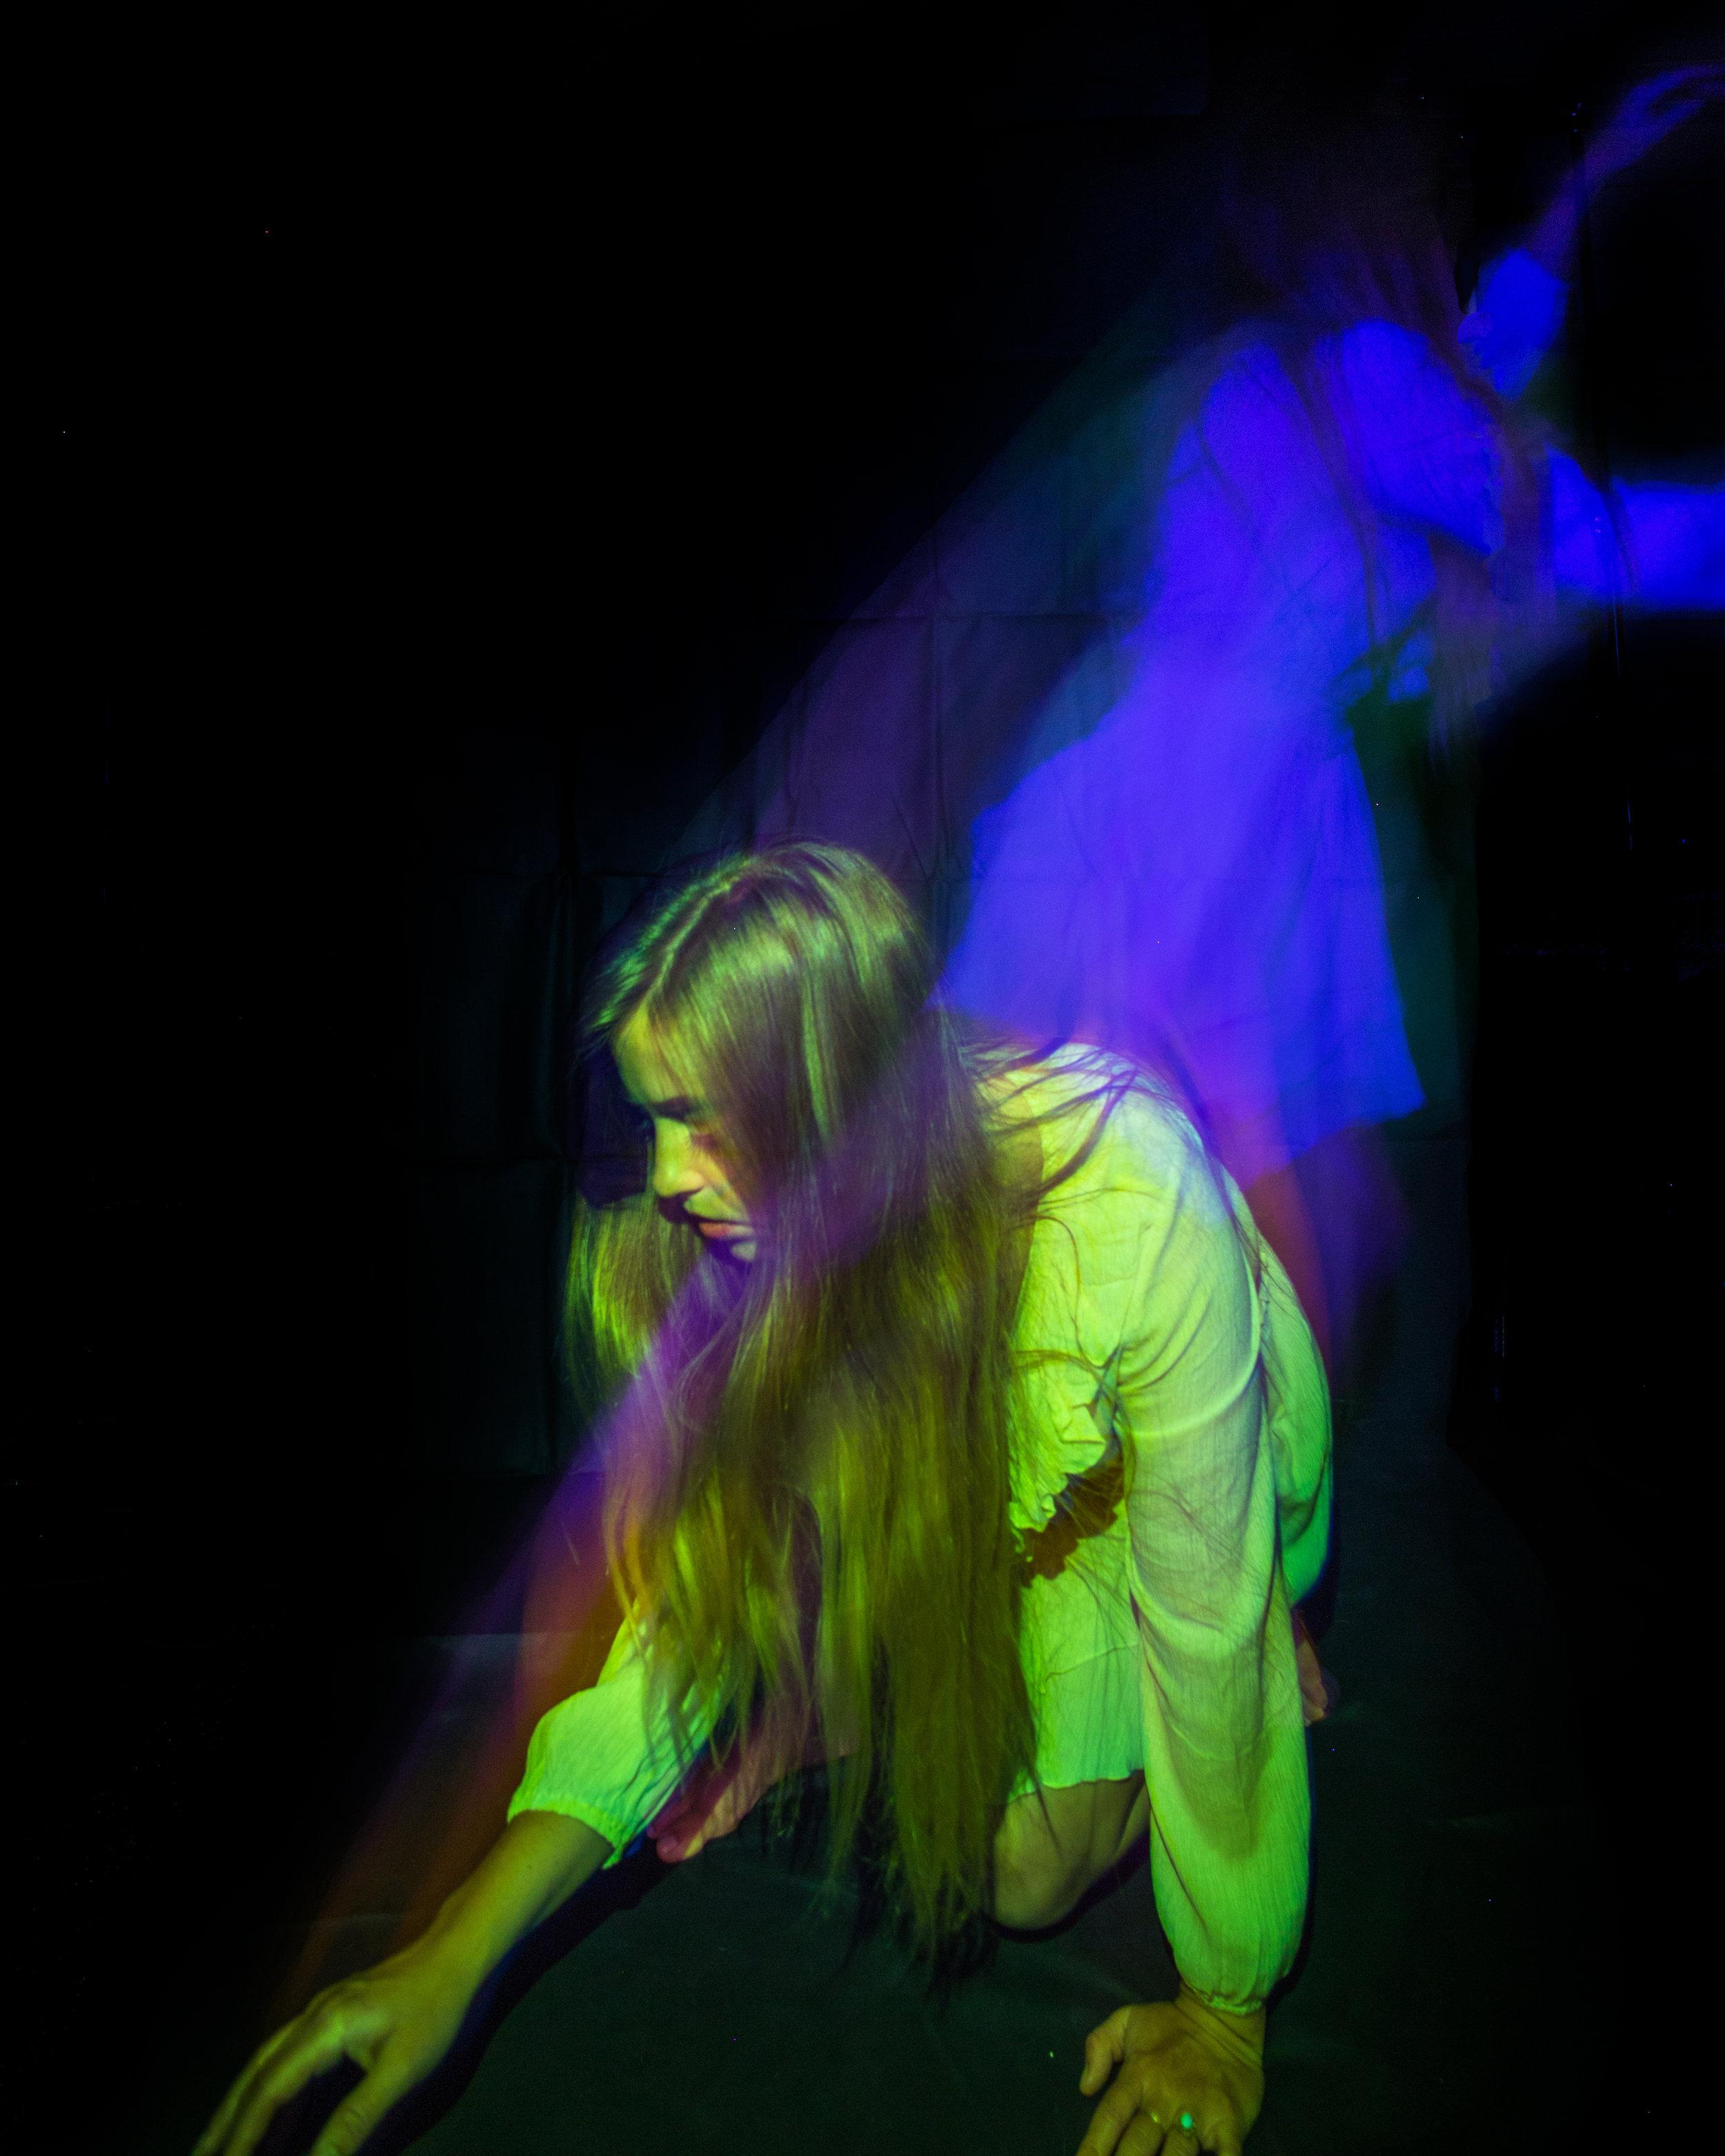 JordanRose_DarrenPearson_AstroBandit_DariusTwin_lightpainting_psychedelic_dancer_3.jpg